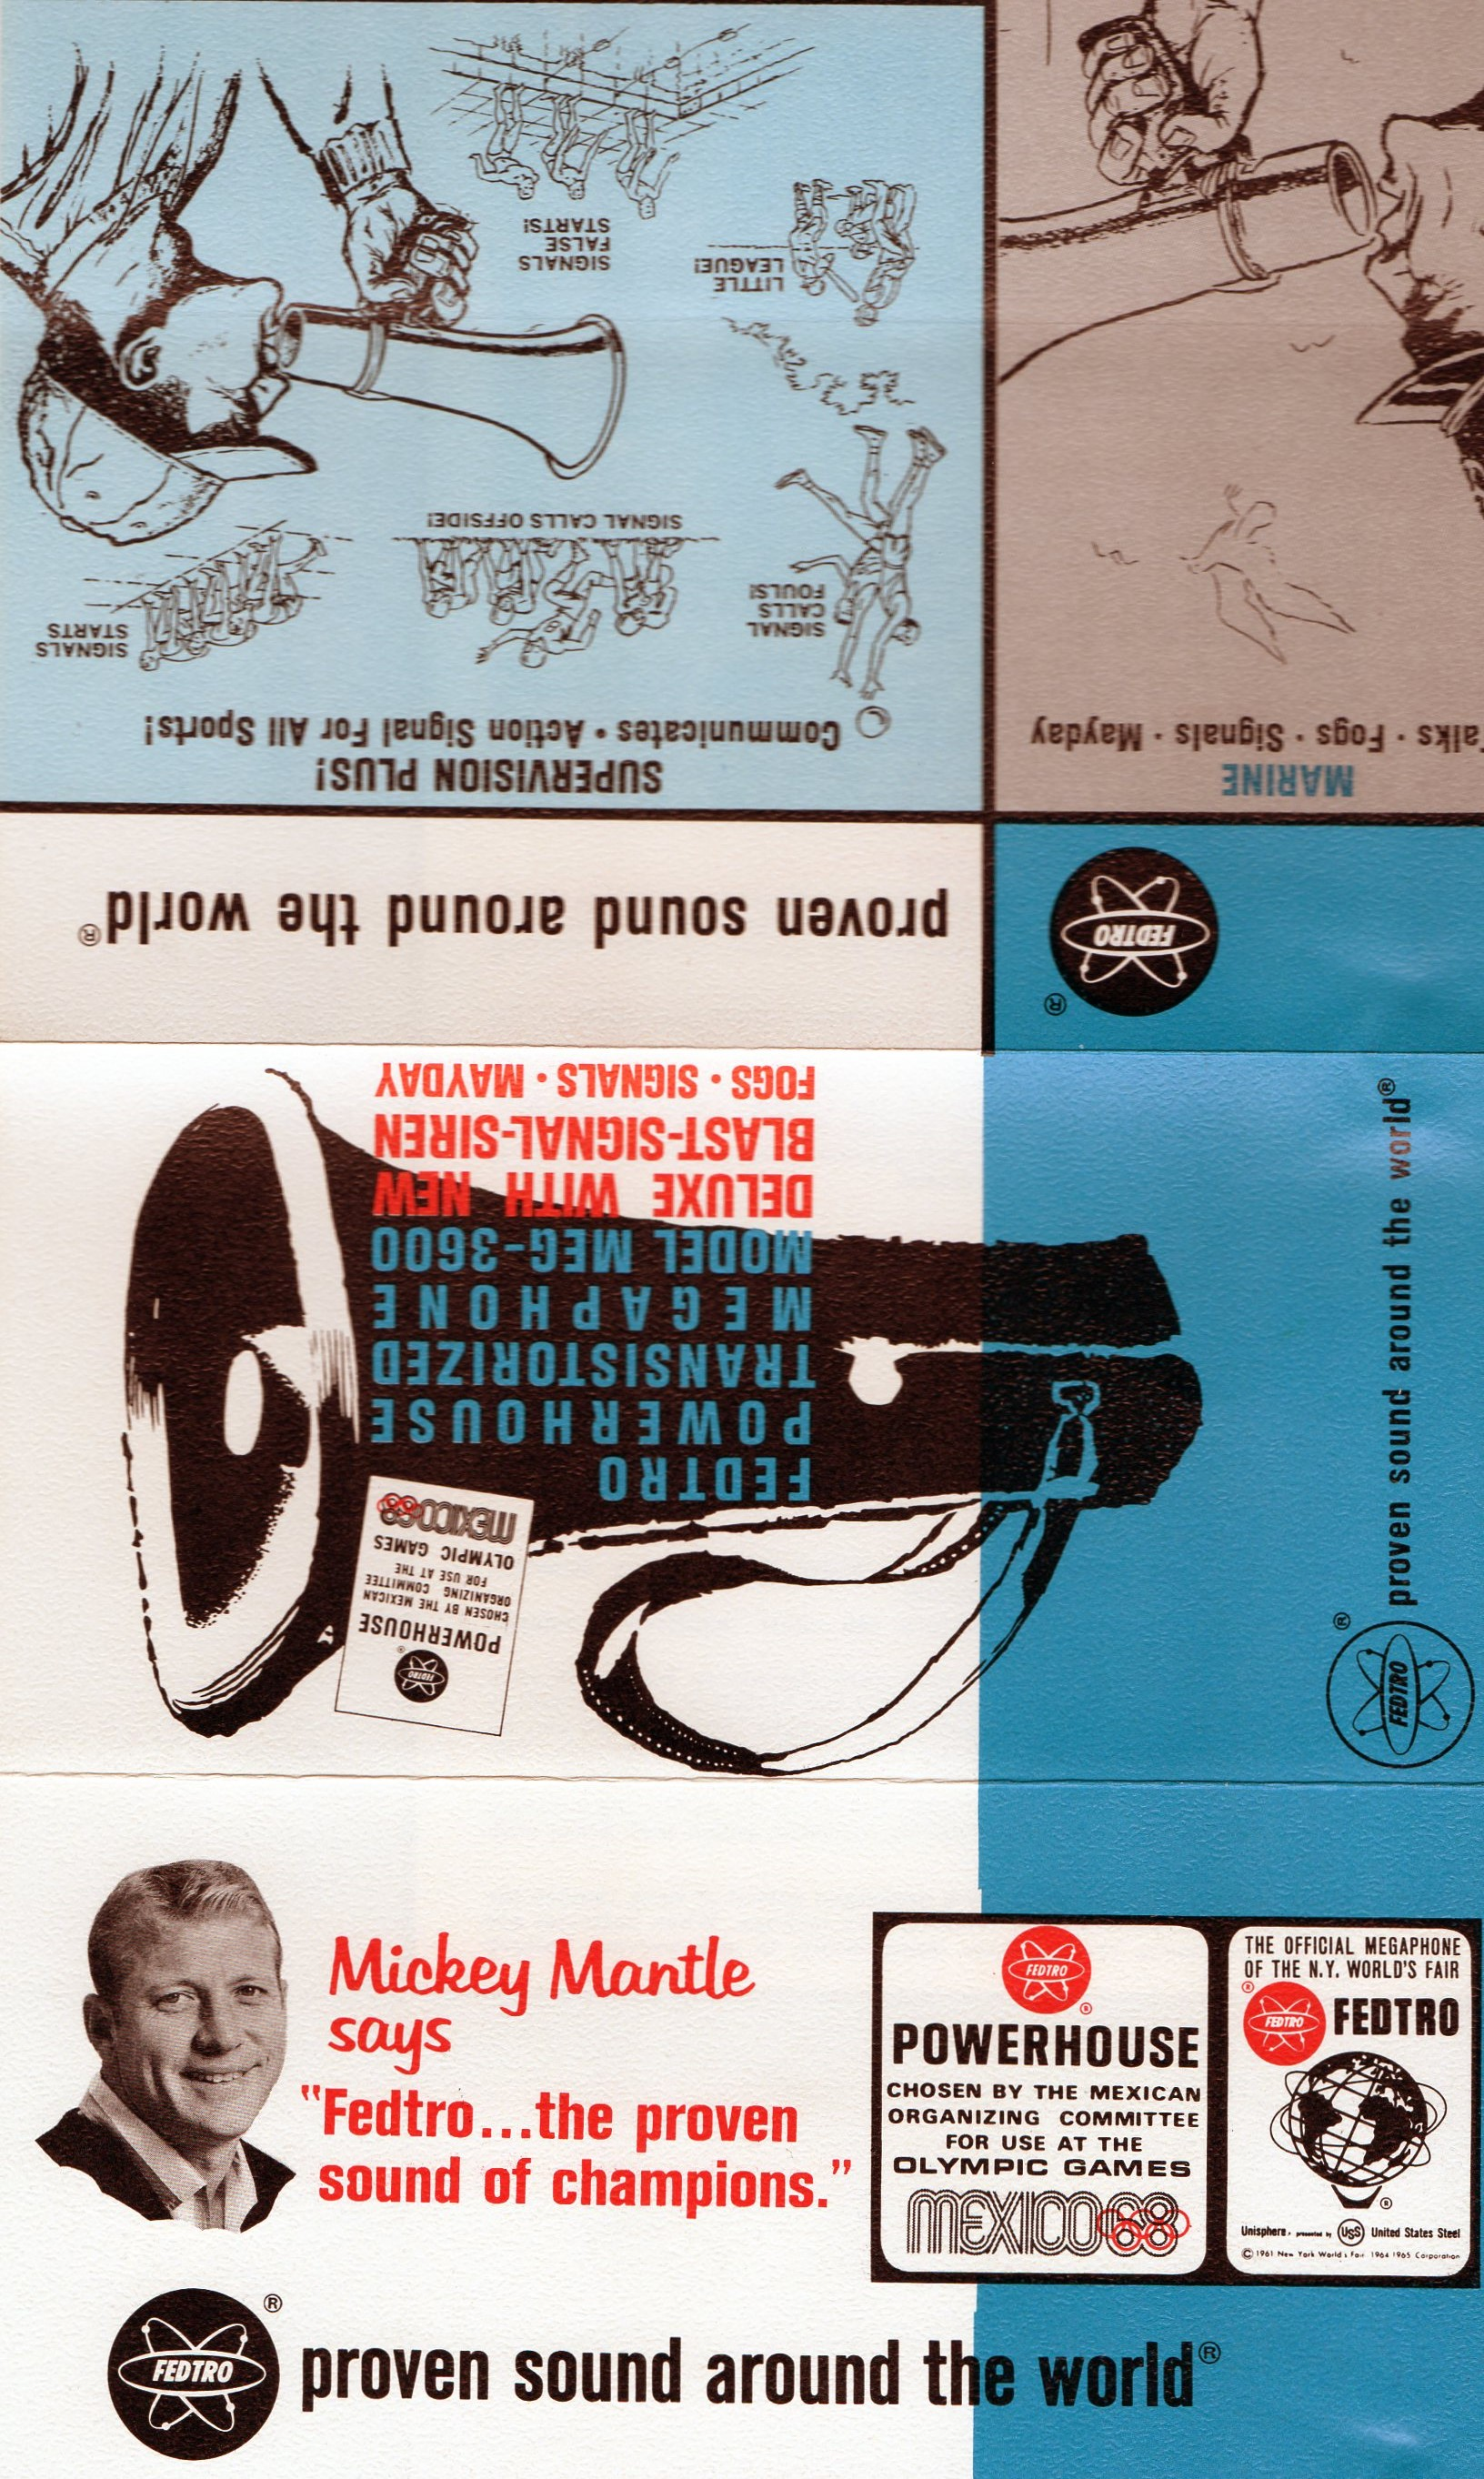 1969-71 megaphone brochure